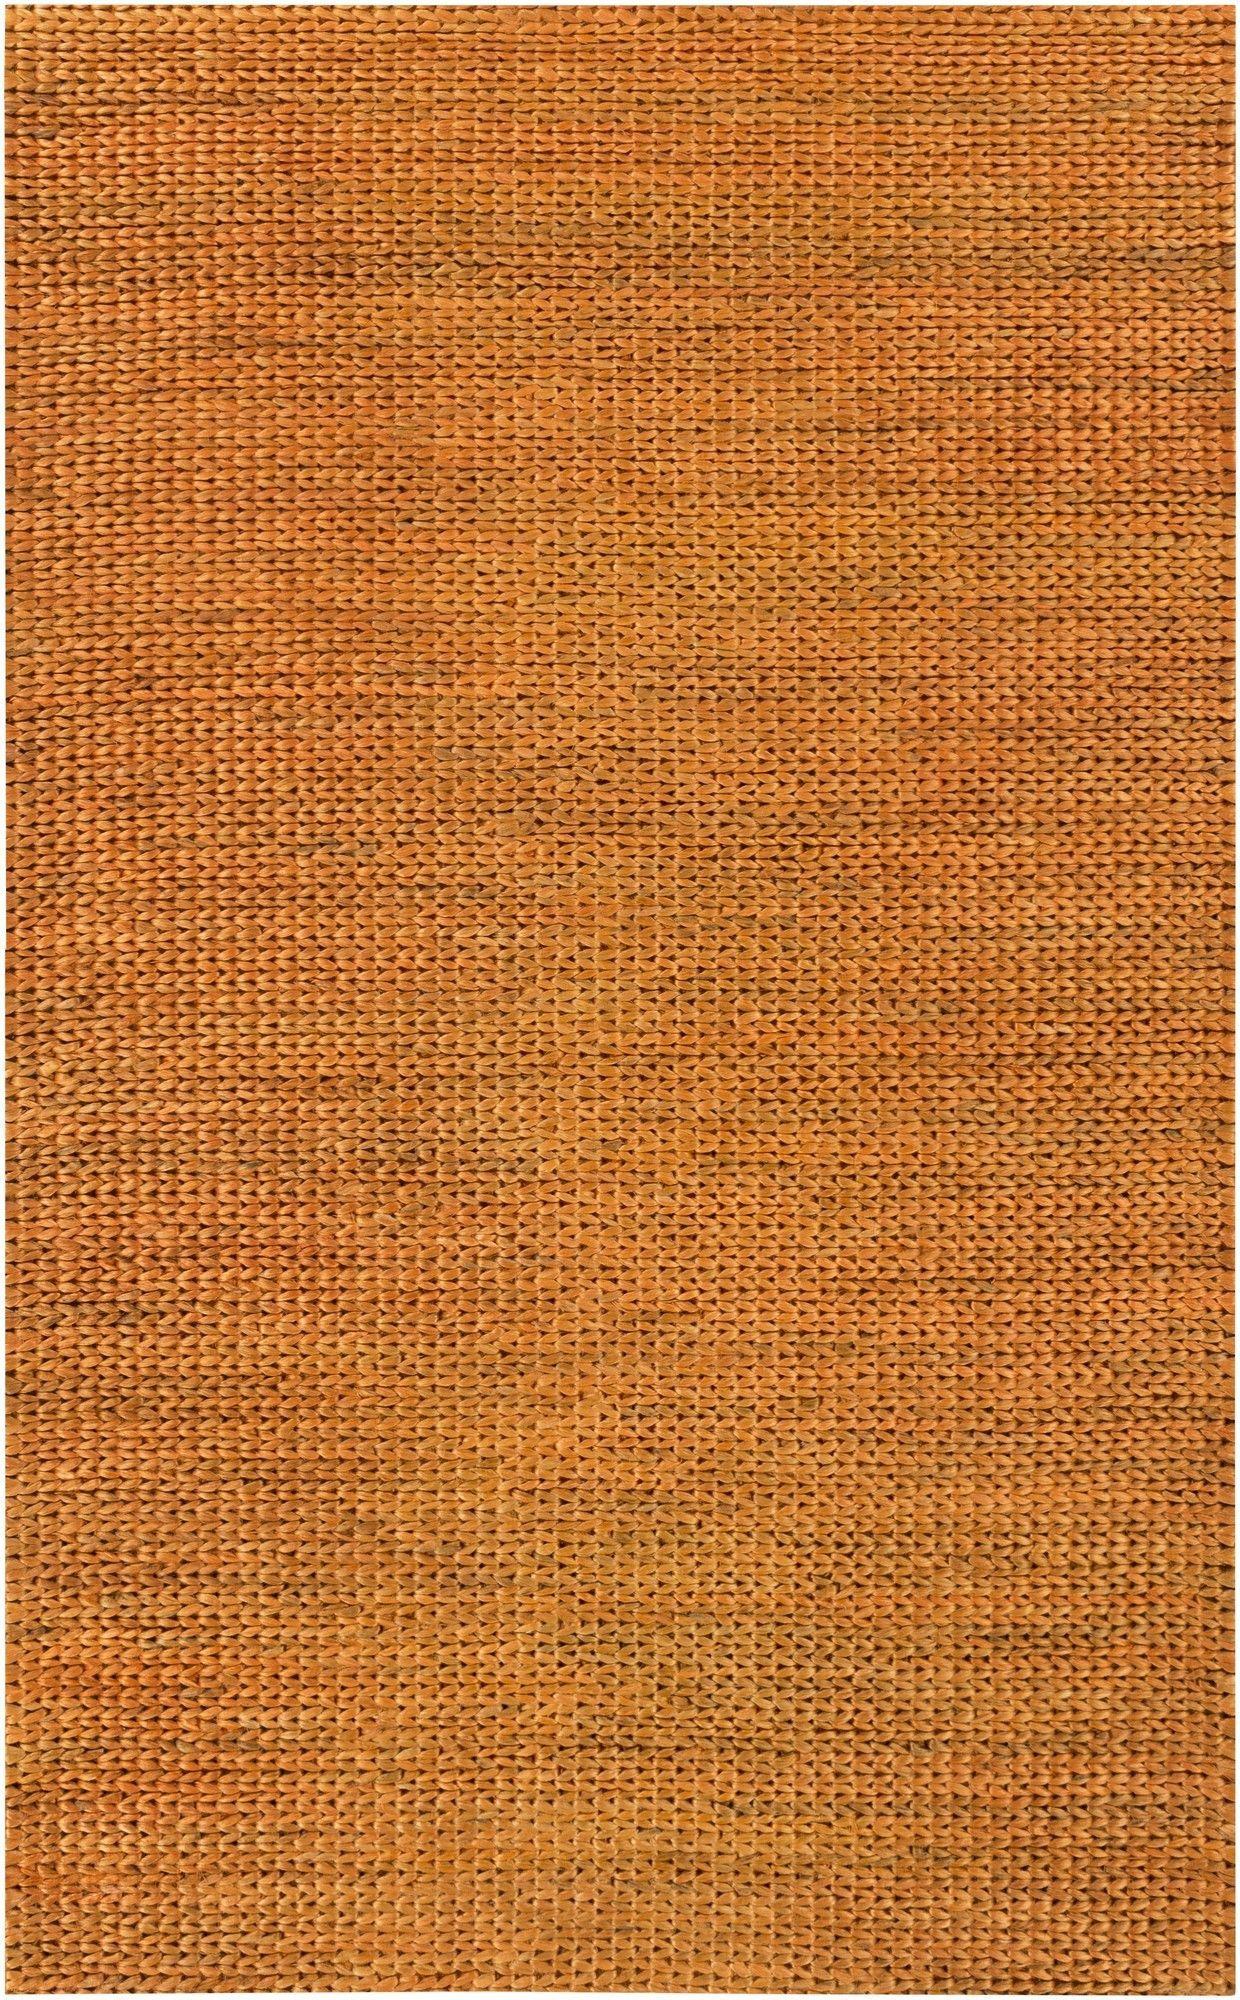 Tropics Burnt Orange Area Rug